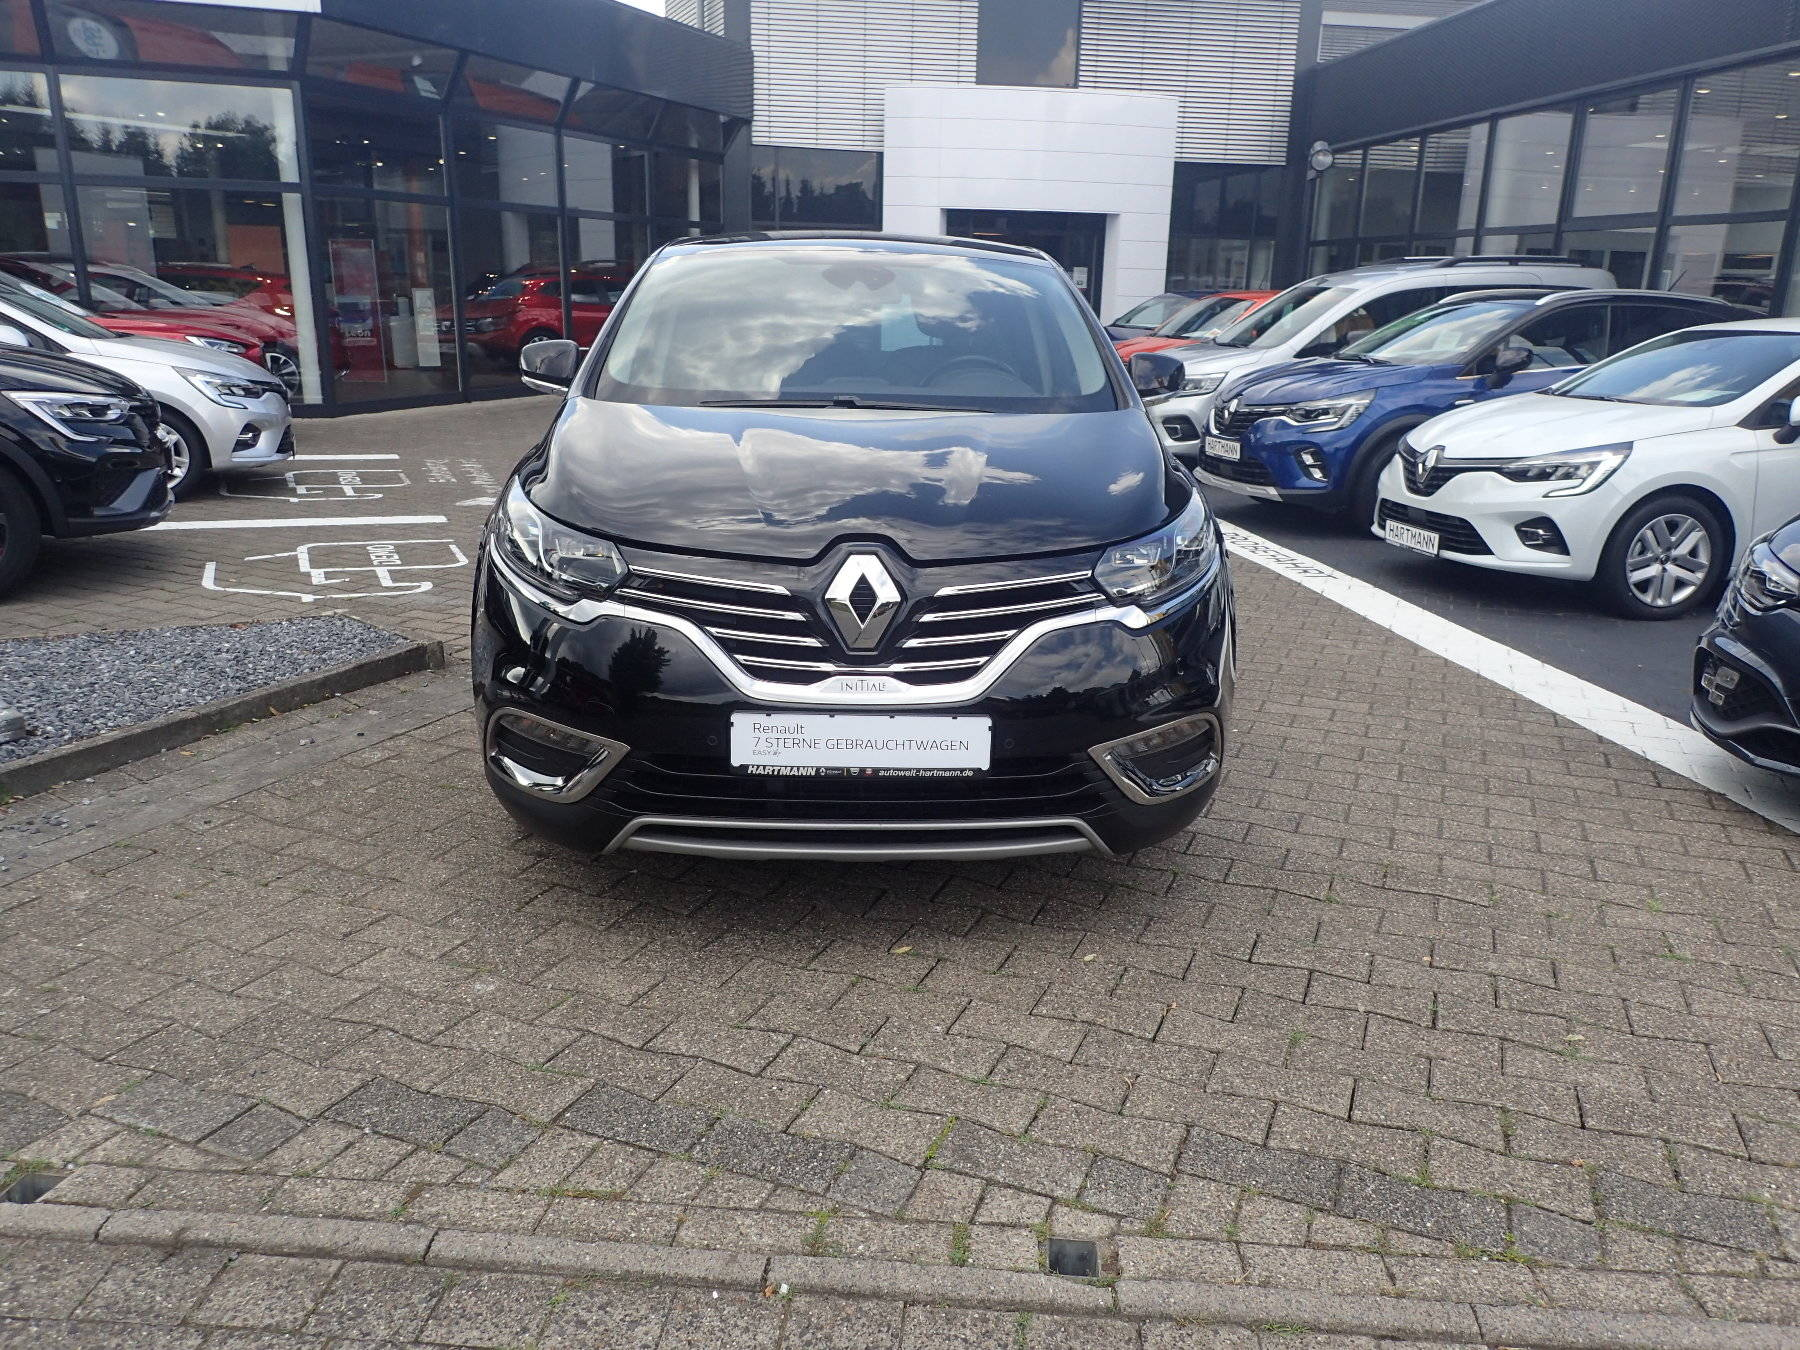 Renault Espace Initiale Paris ENERGY dCi 160 Nappa-Leder, Jahr 2016, Diesel